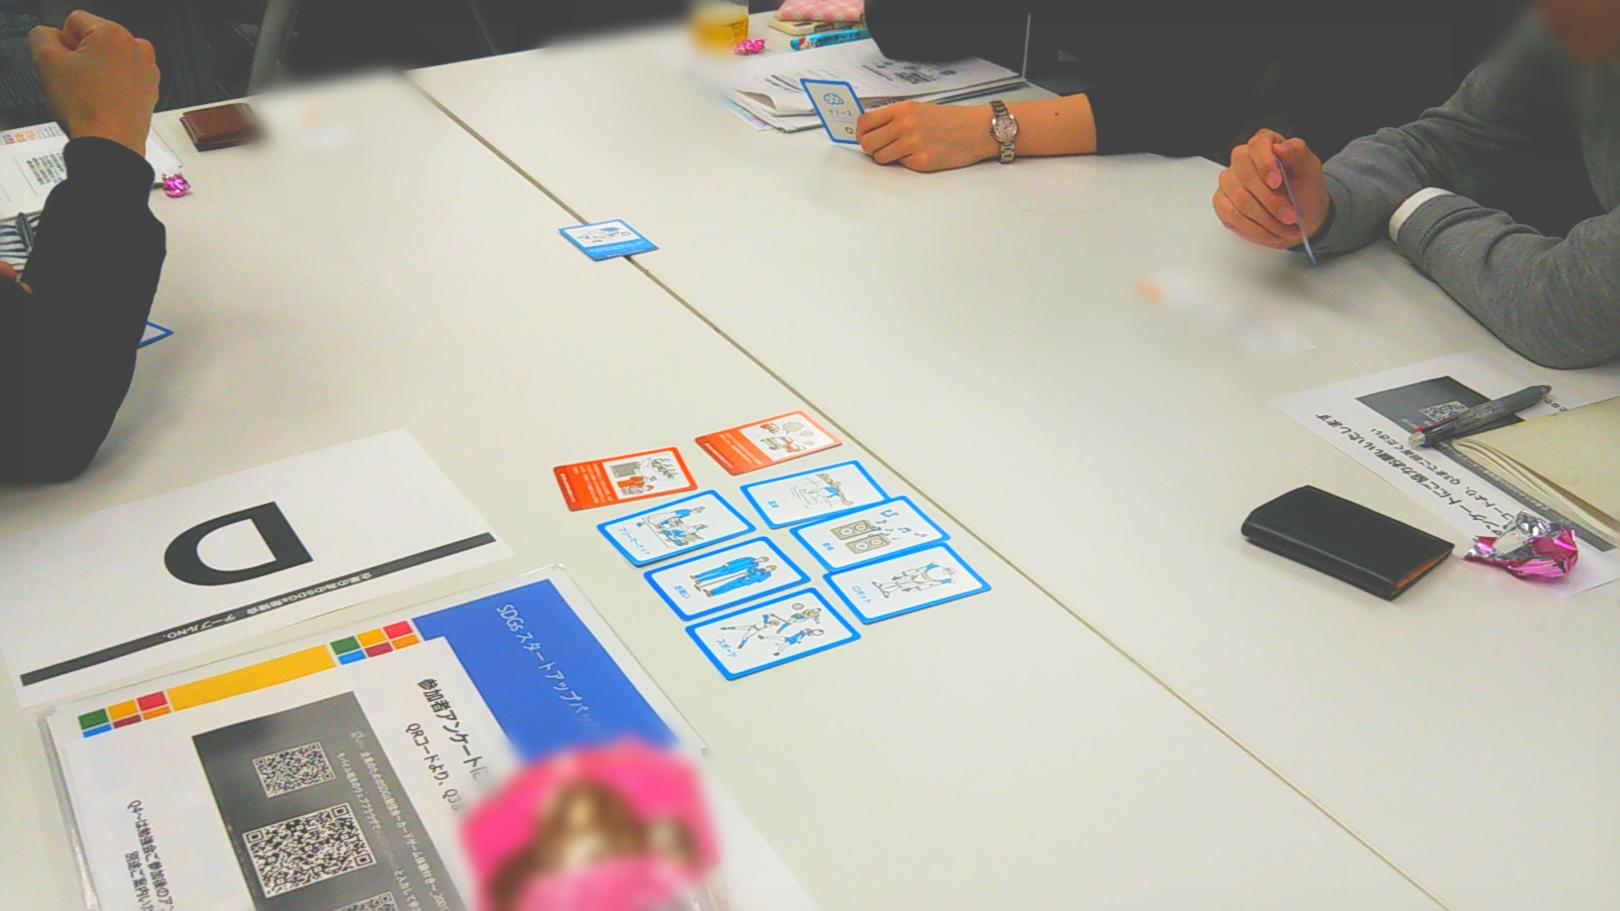 SDGsカードゲーム研修 - SDGsが感覚的にわかるカードゲーム体験付き!「SDGs勉強会」開催レポート